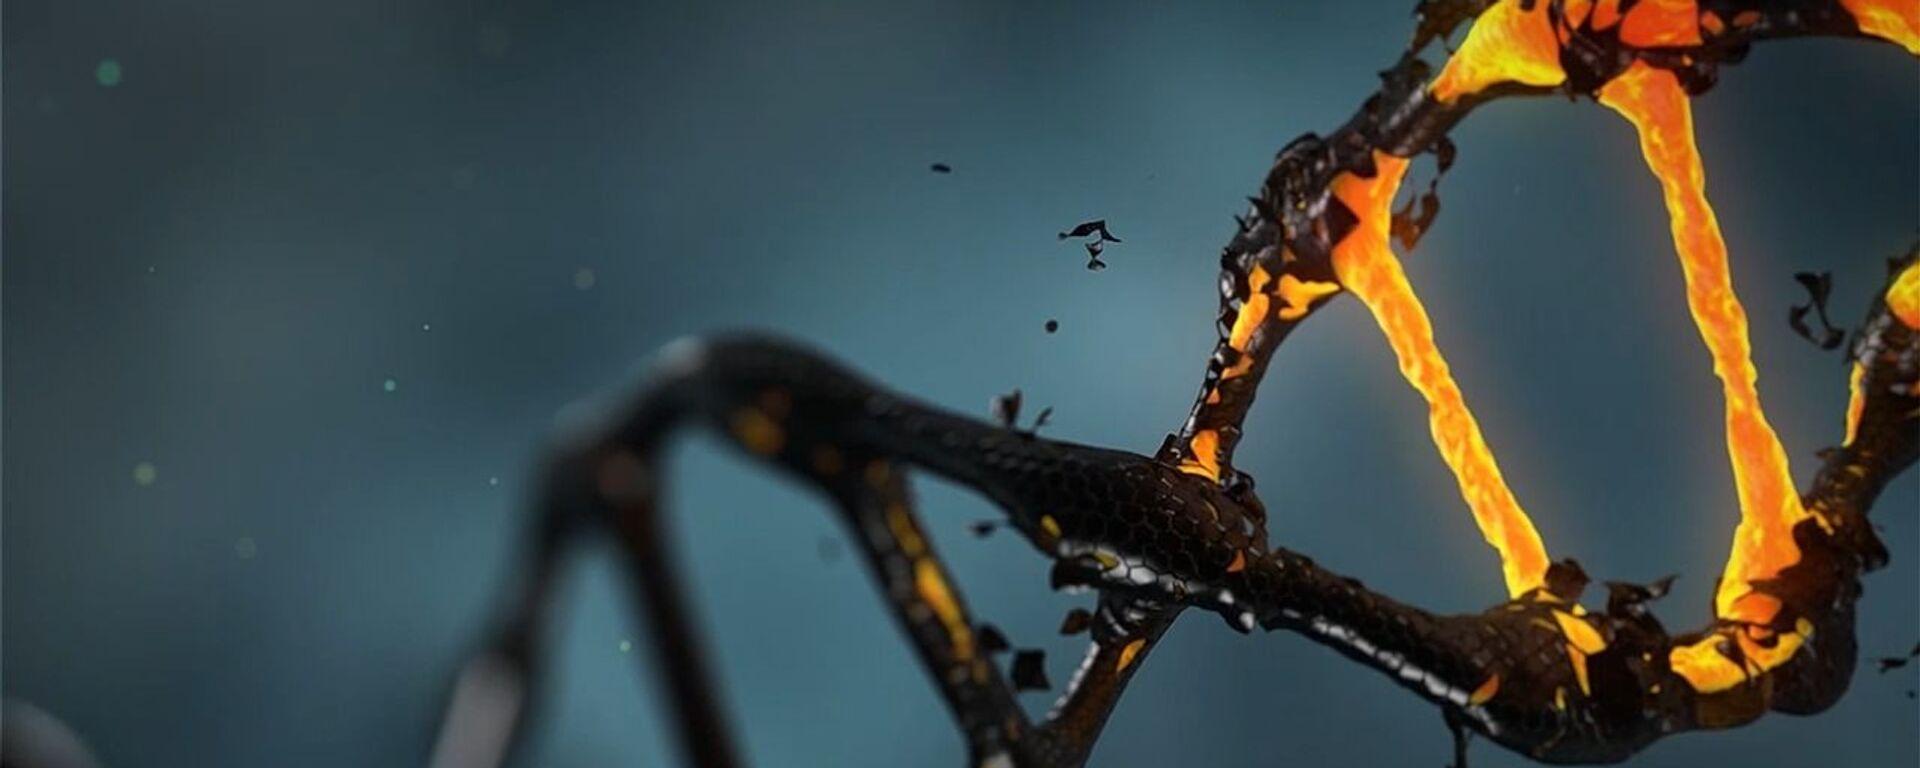 El ADN, imagen referencial - Sputnik Mundo, 1920, 07.12.2019